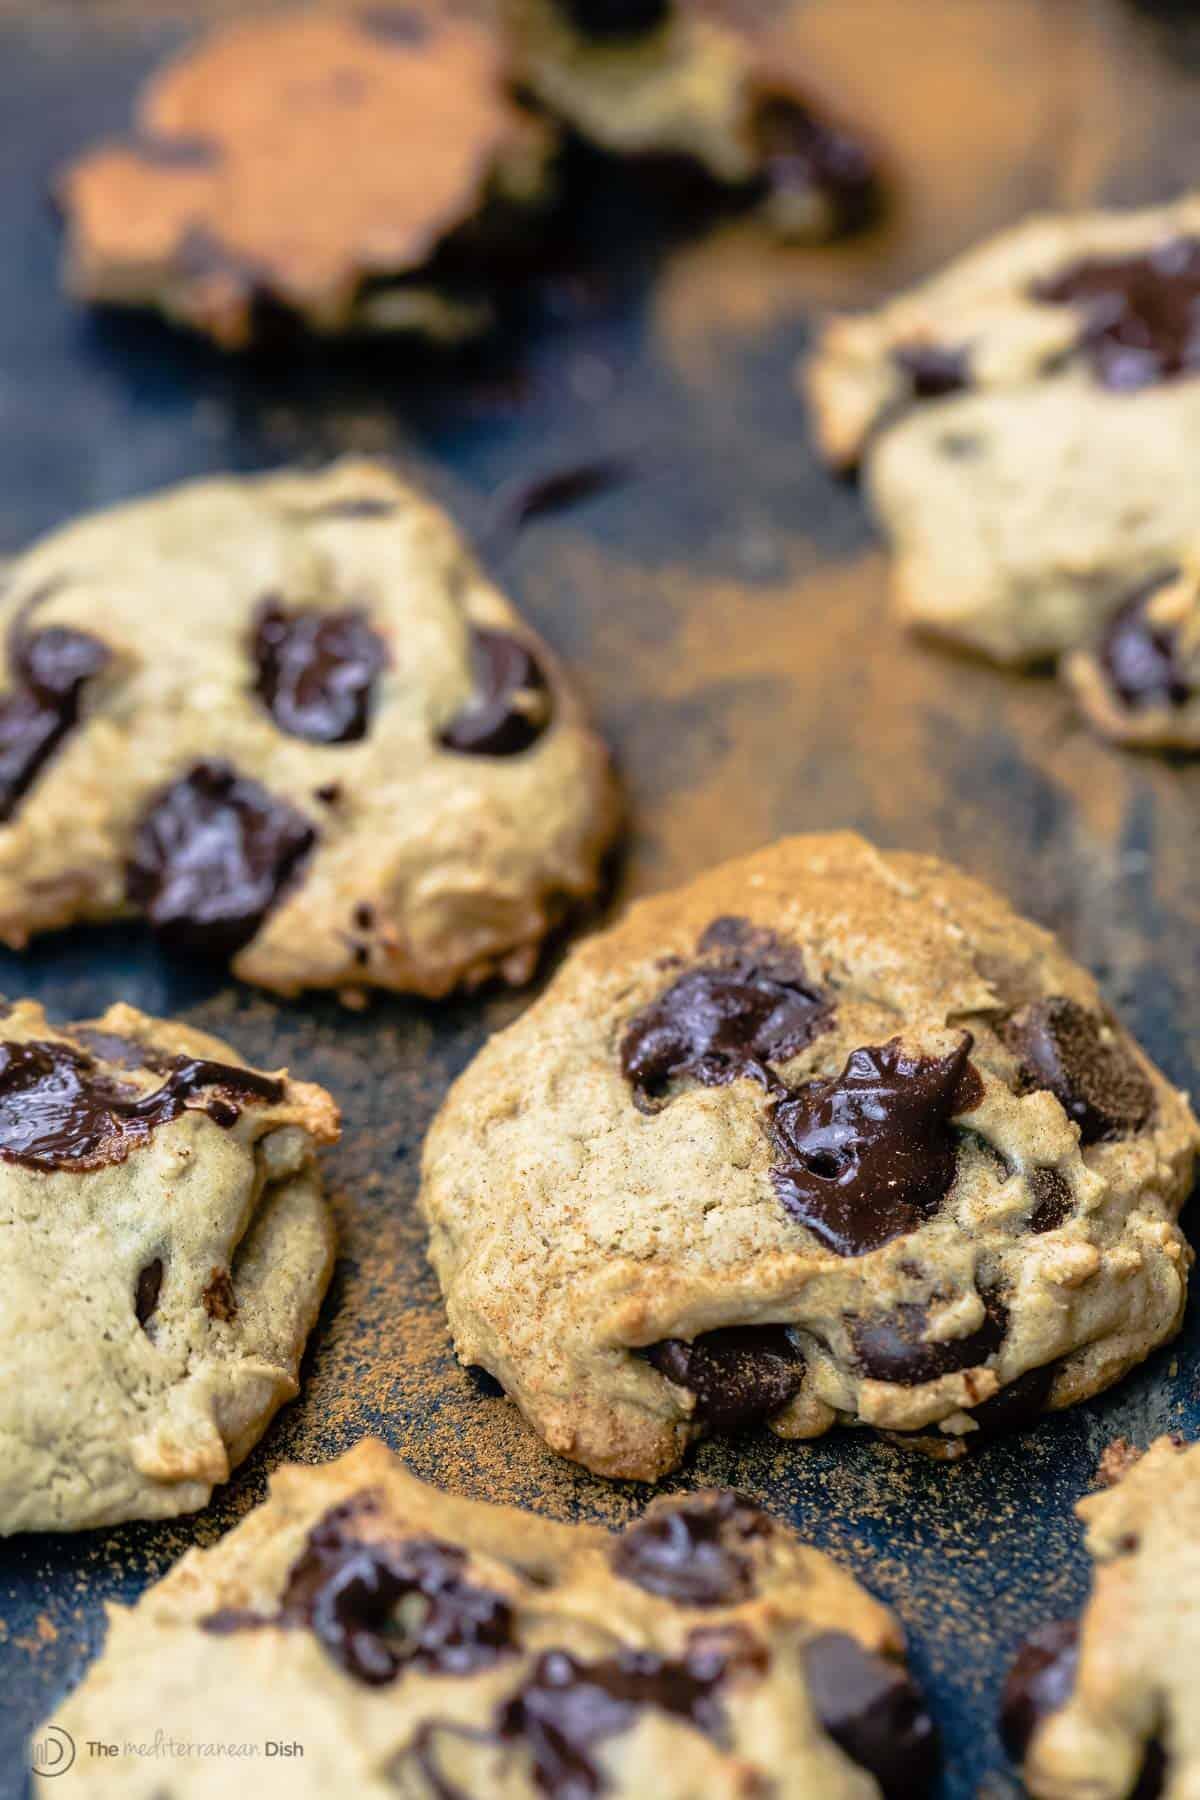 Tahini chocolate chip cookies dusted with cinnamon